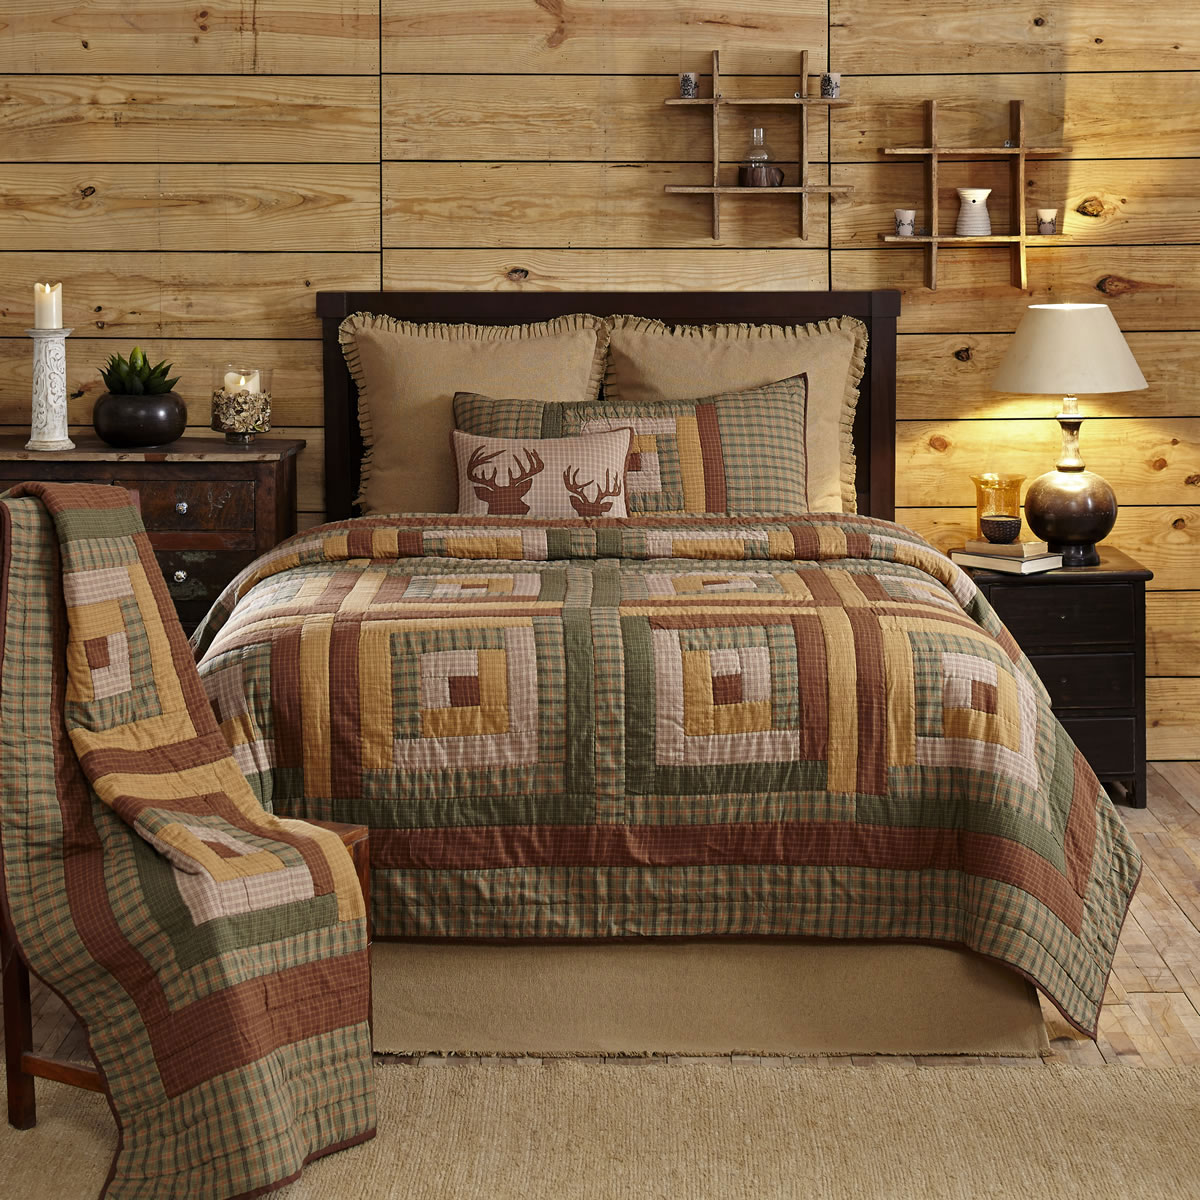 Tallmadge By Vhc Brands Quilts Beddingsuperstore Com